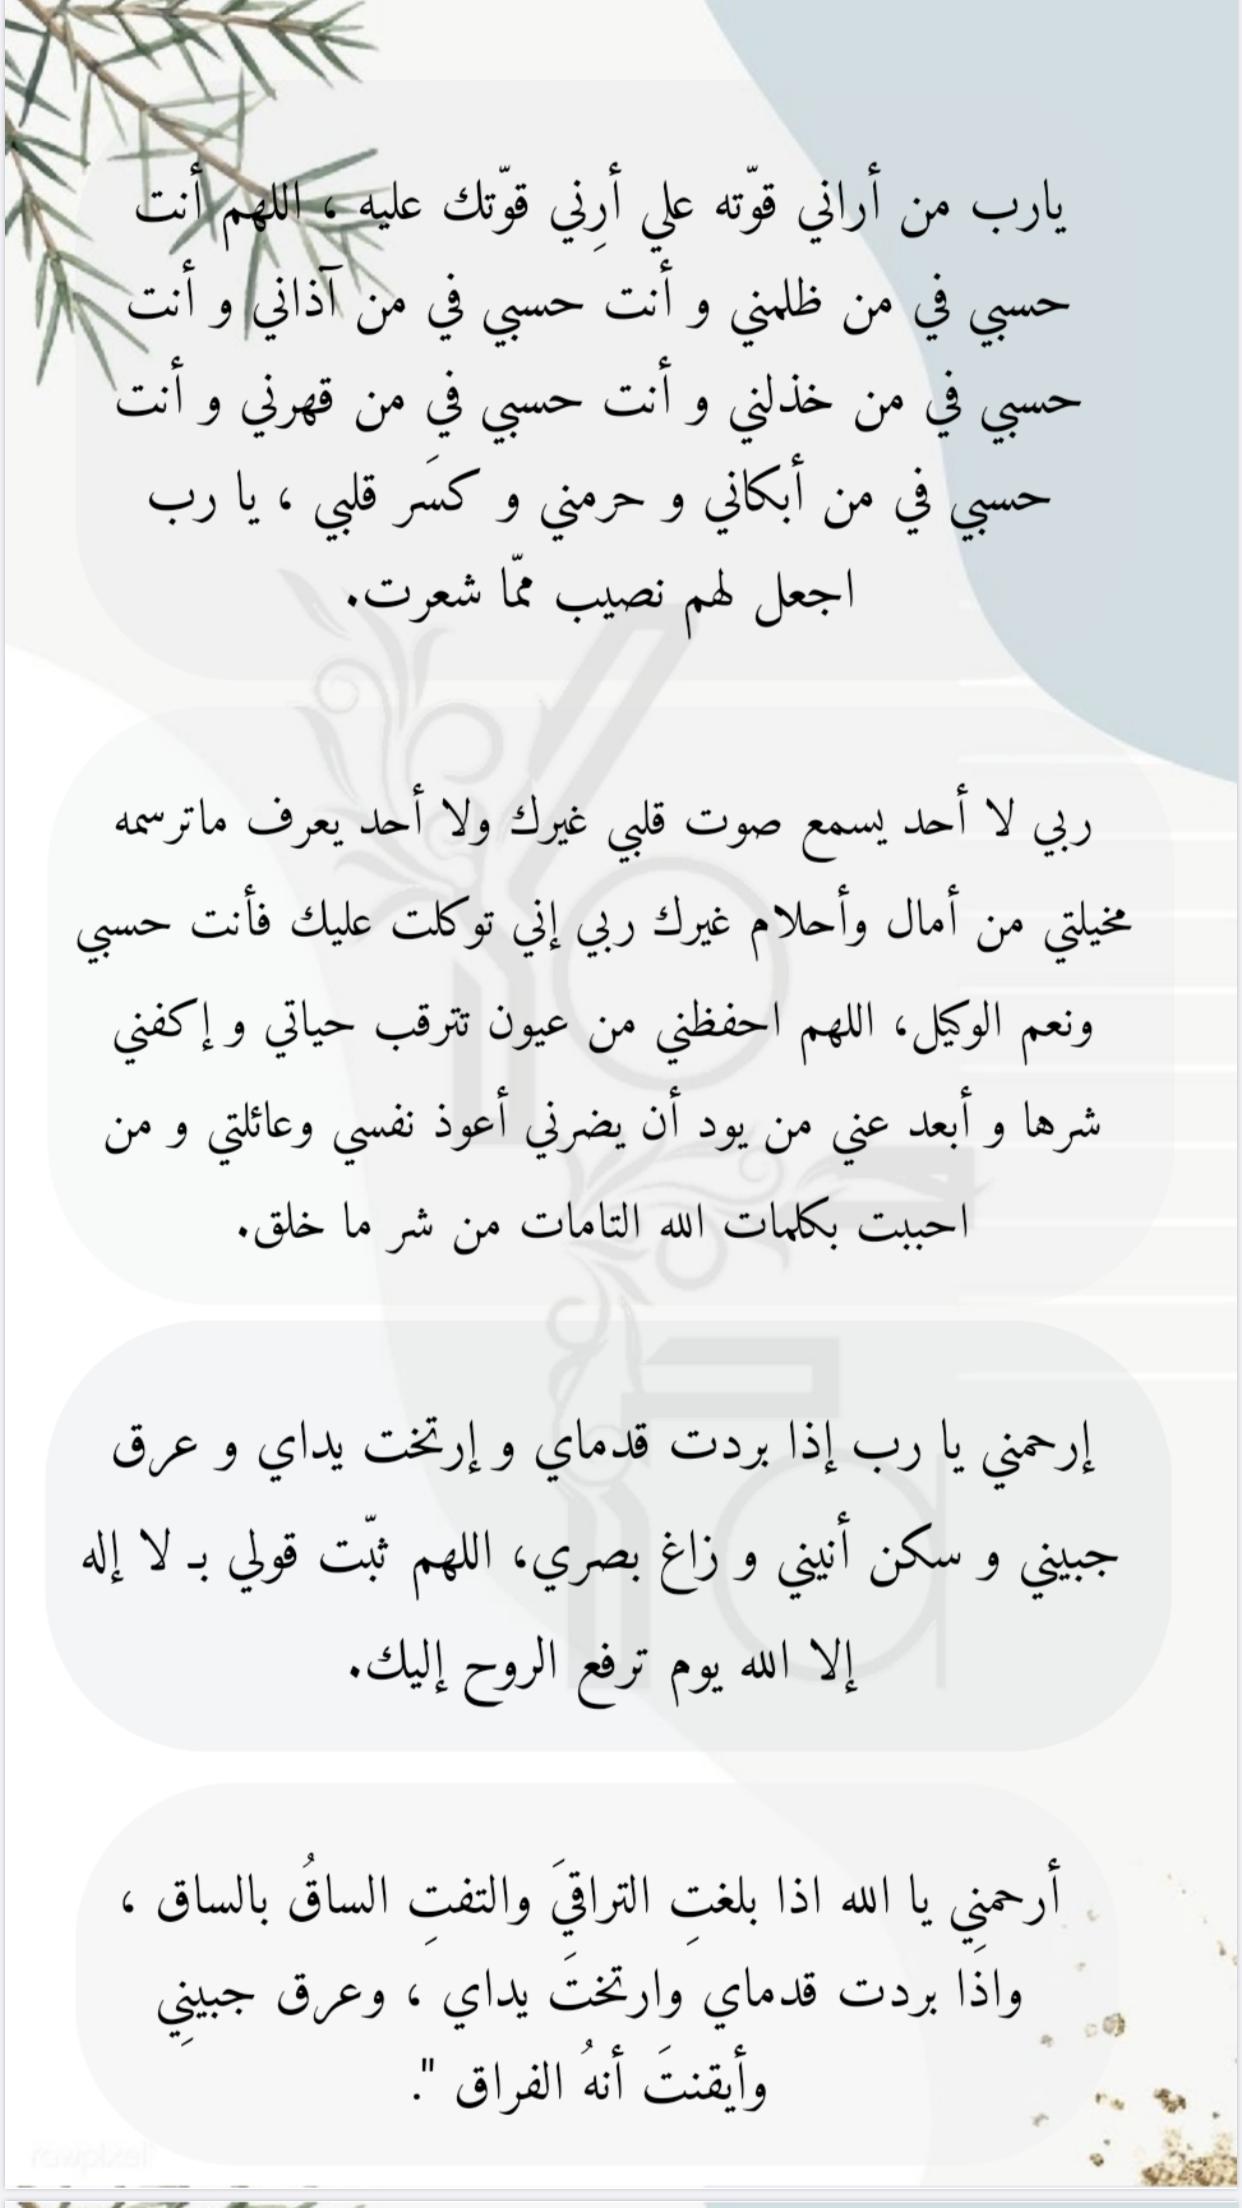 ادعية رمضان دعاء ليلة القدر صور Quran Quotes Islamic Inspirational Quotes Morning Quotes Images